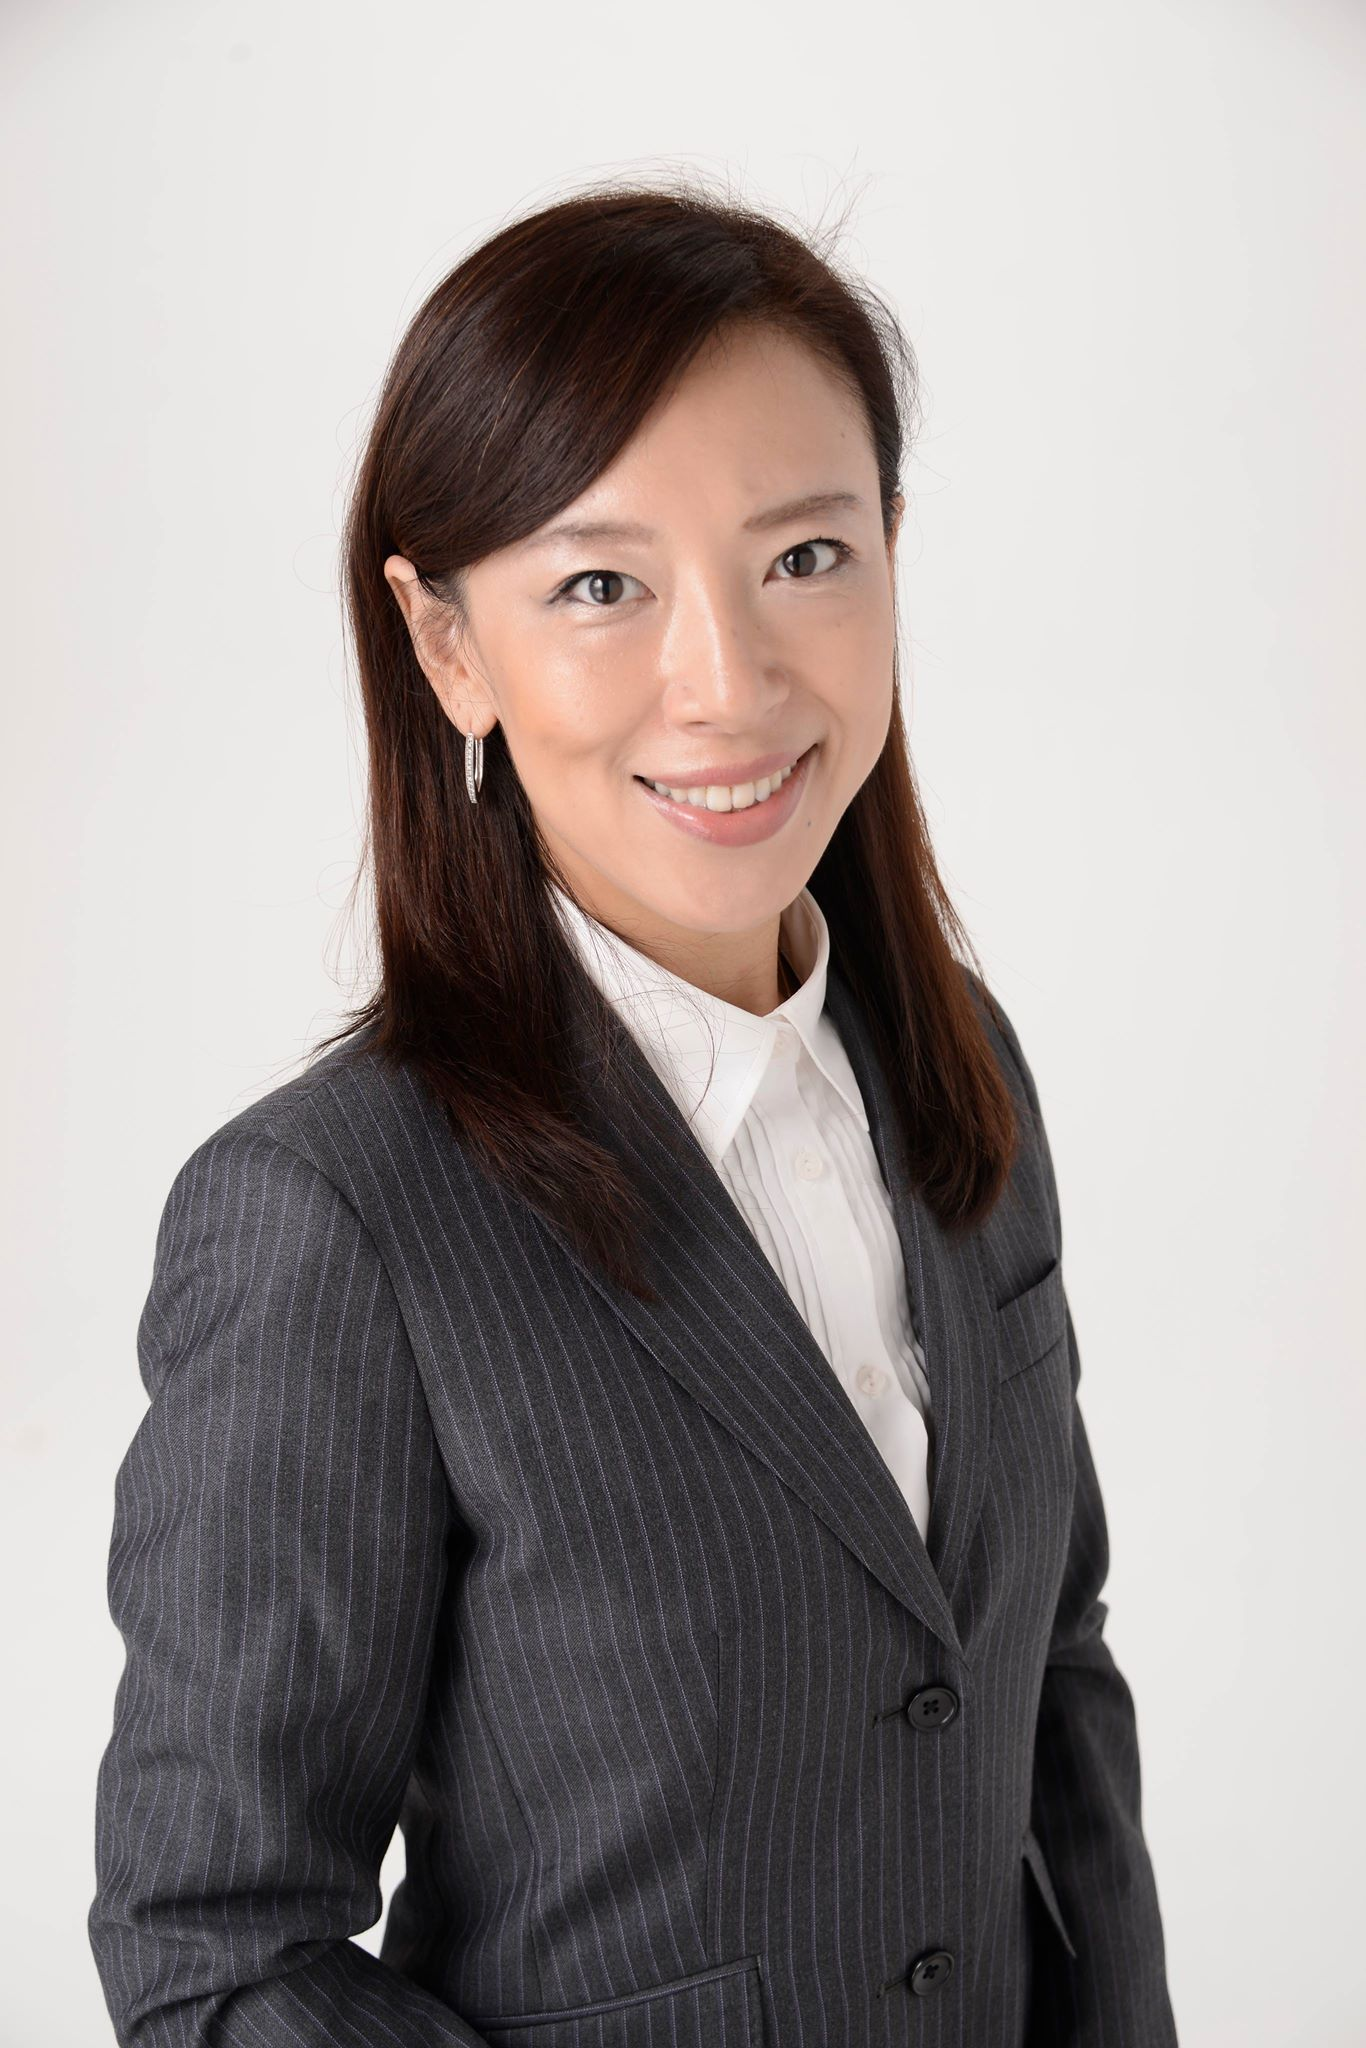 長谷川悦子(えつこ) 立憲民主党 横浜市会議員 栄区選出